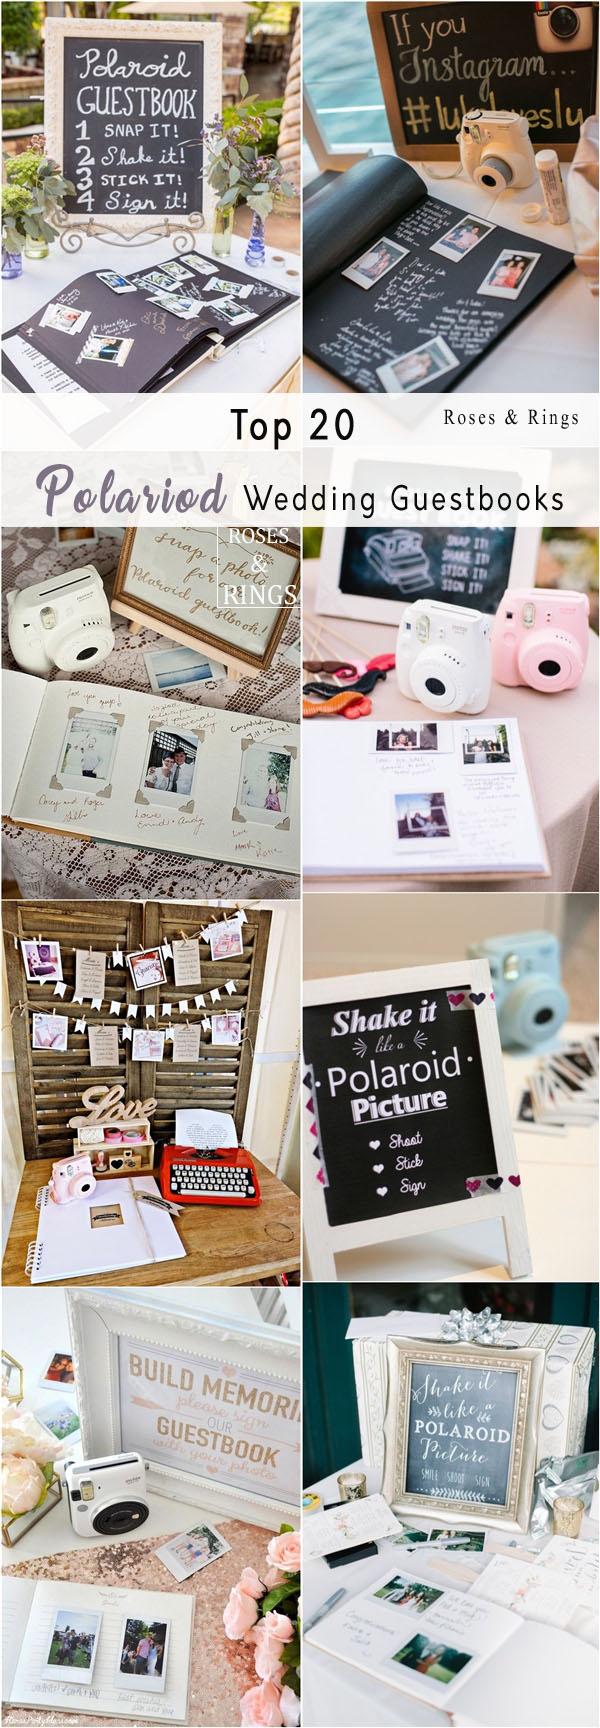 Poloroid Wedding Ideas Unique Polaroid Wedding Guestbook Ideas Roses Rings Weddings